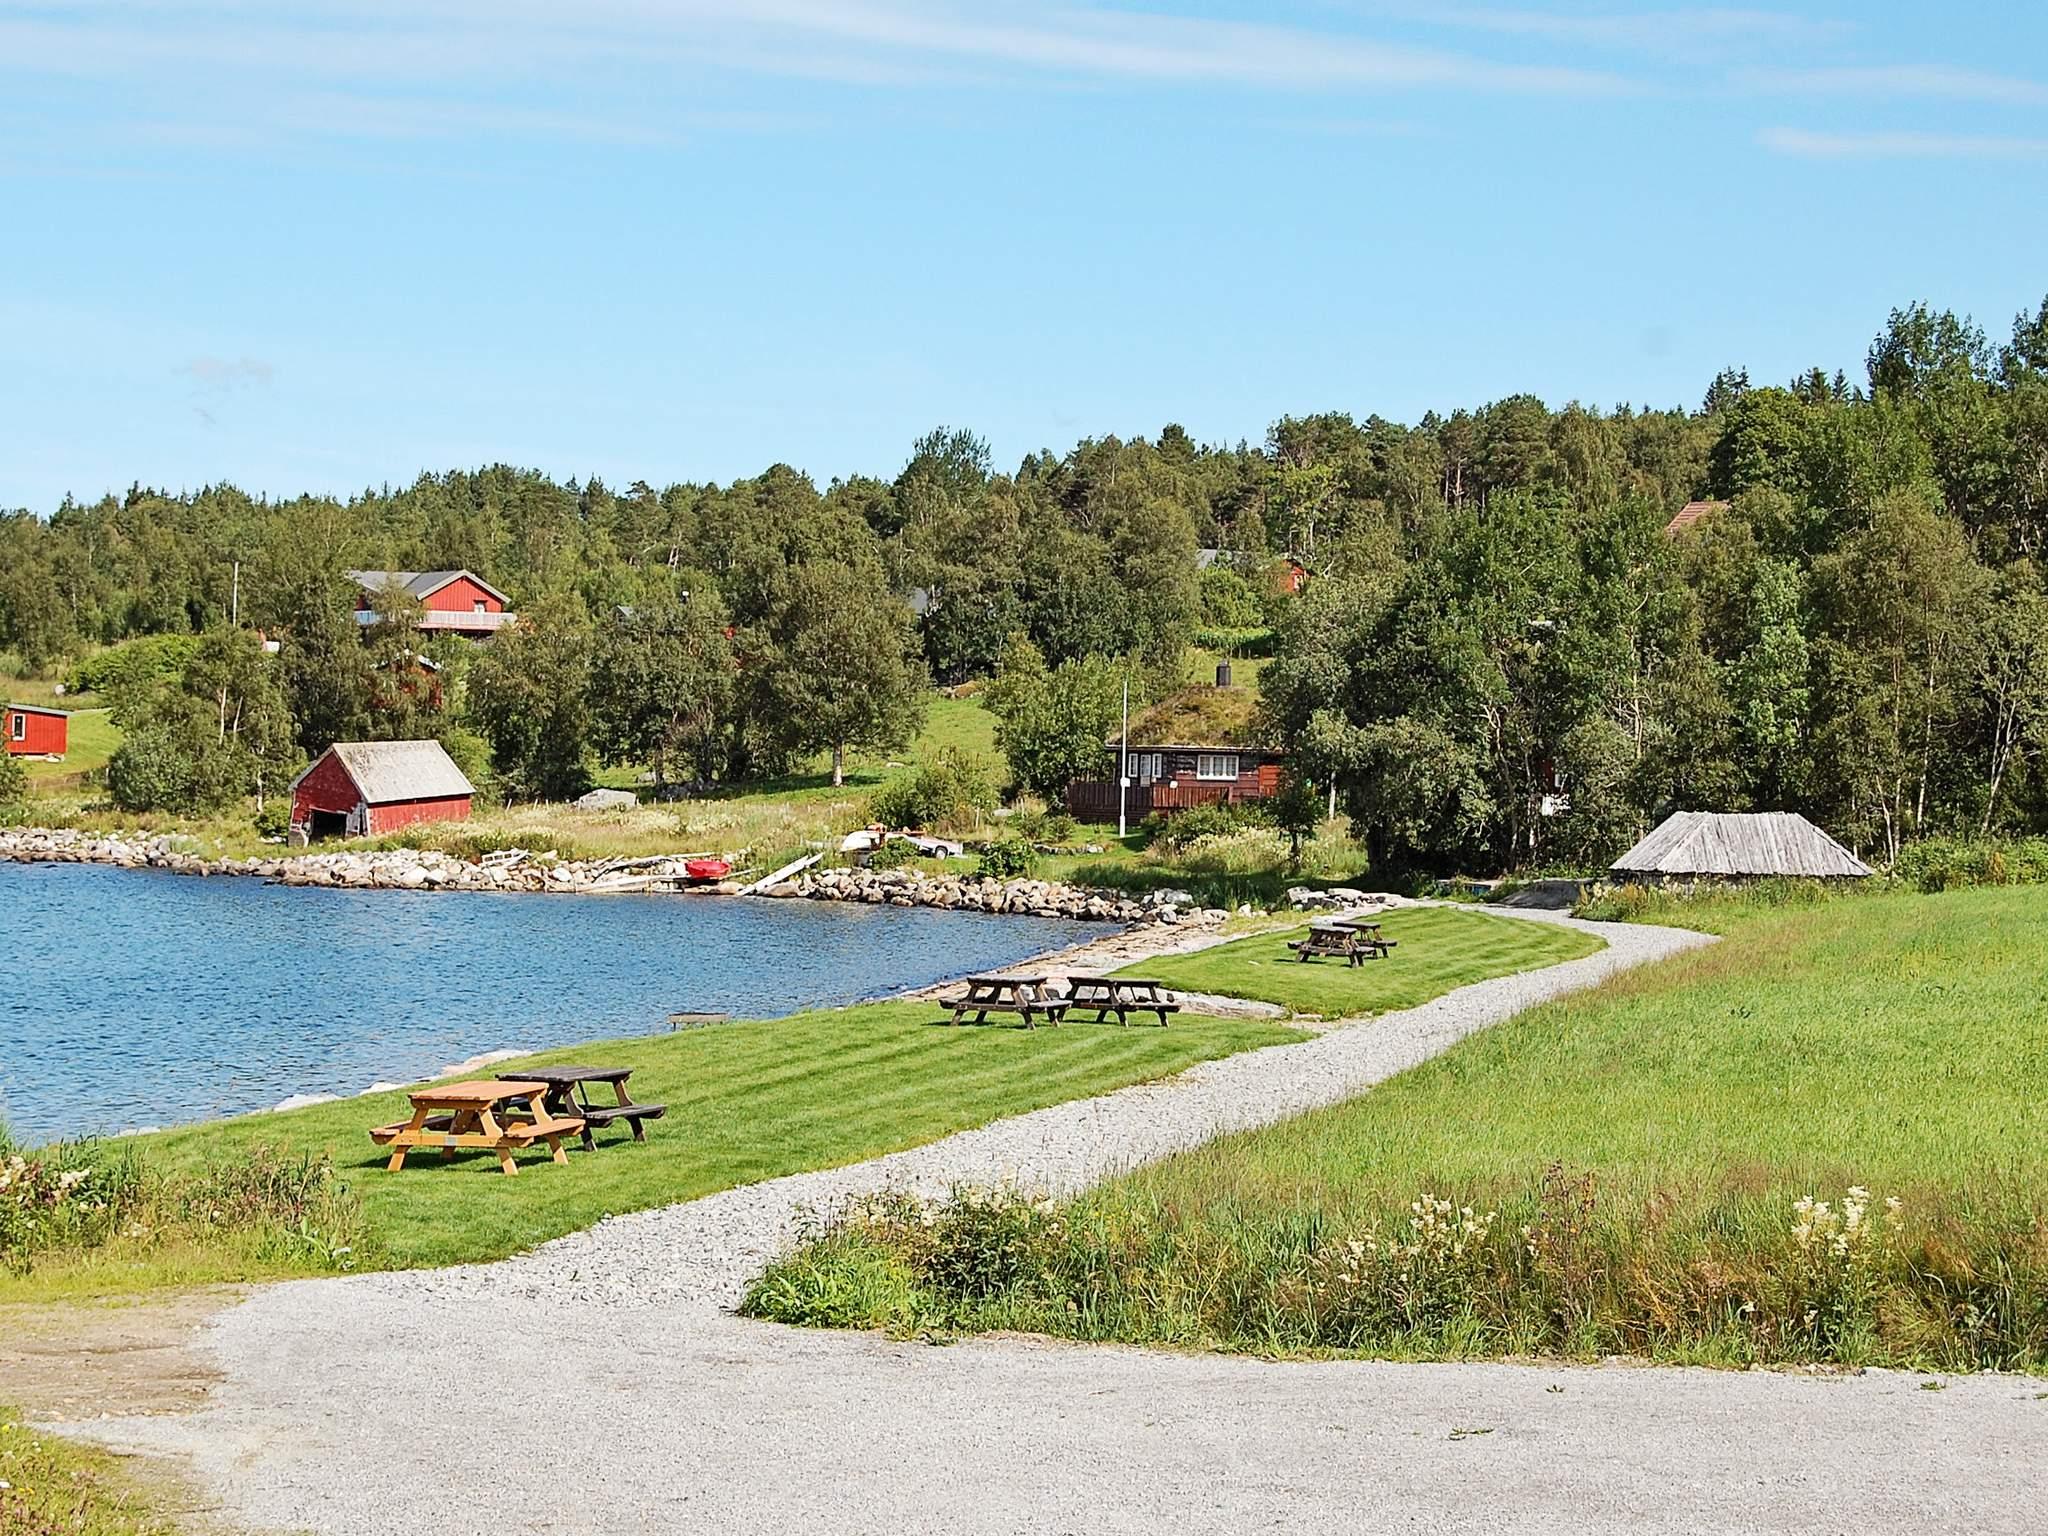 Ferienhaus Vik (1585400), Tomrefjord, More - Romsdal, Westnorwegen, Norwegen, Bild 30